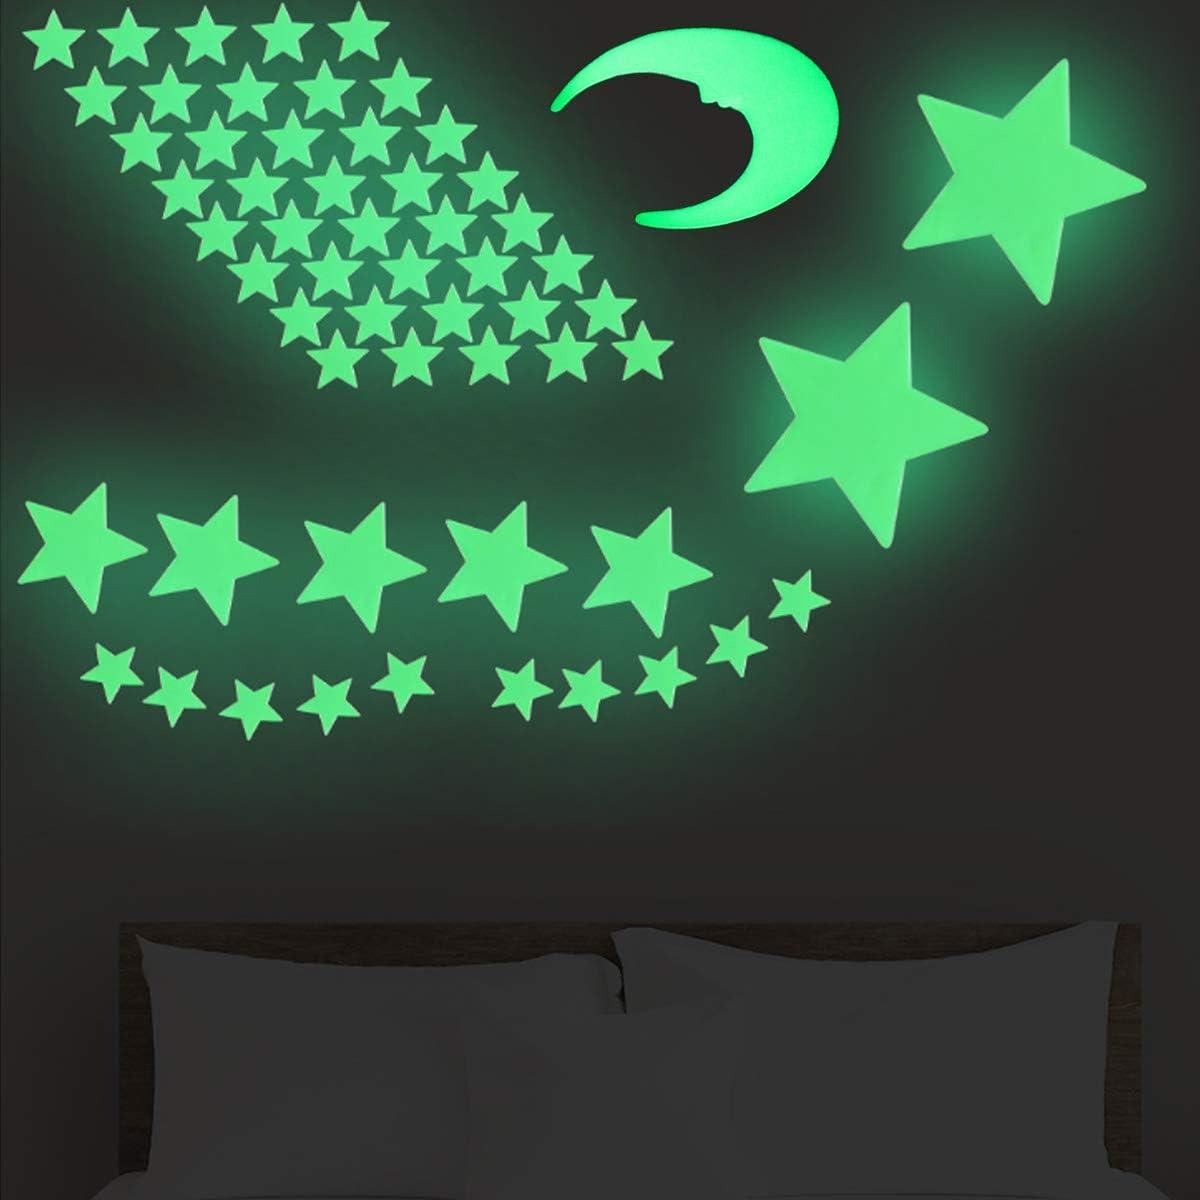 Tianher Luminoso Pegatinas de Pared,101 Estrellas 8 Planetas10 luna DIY Fluorescente Decoraci/ón Habitaci/ón de Pared para Dormitorio de Ni/ños Chico Ni/ña Beb/é Casa Interior Mural